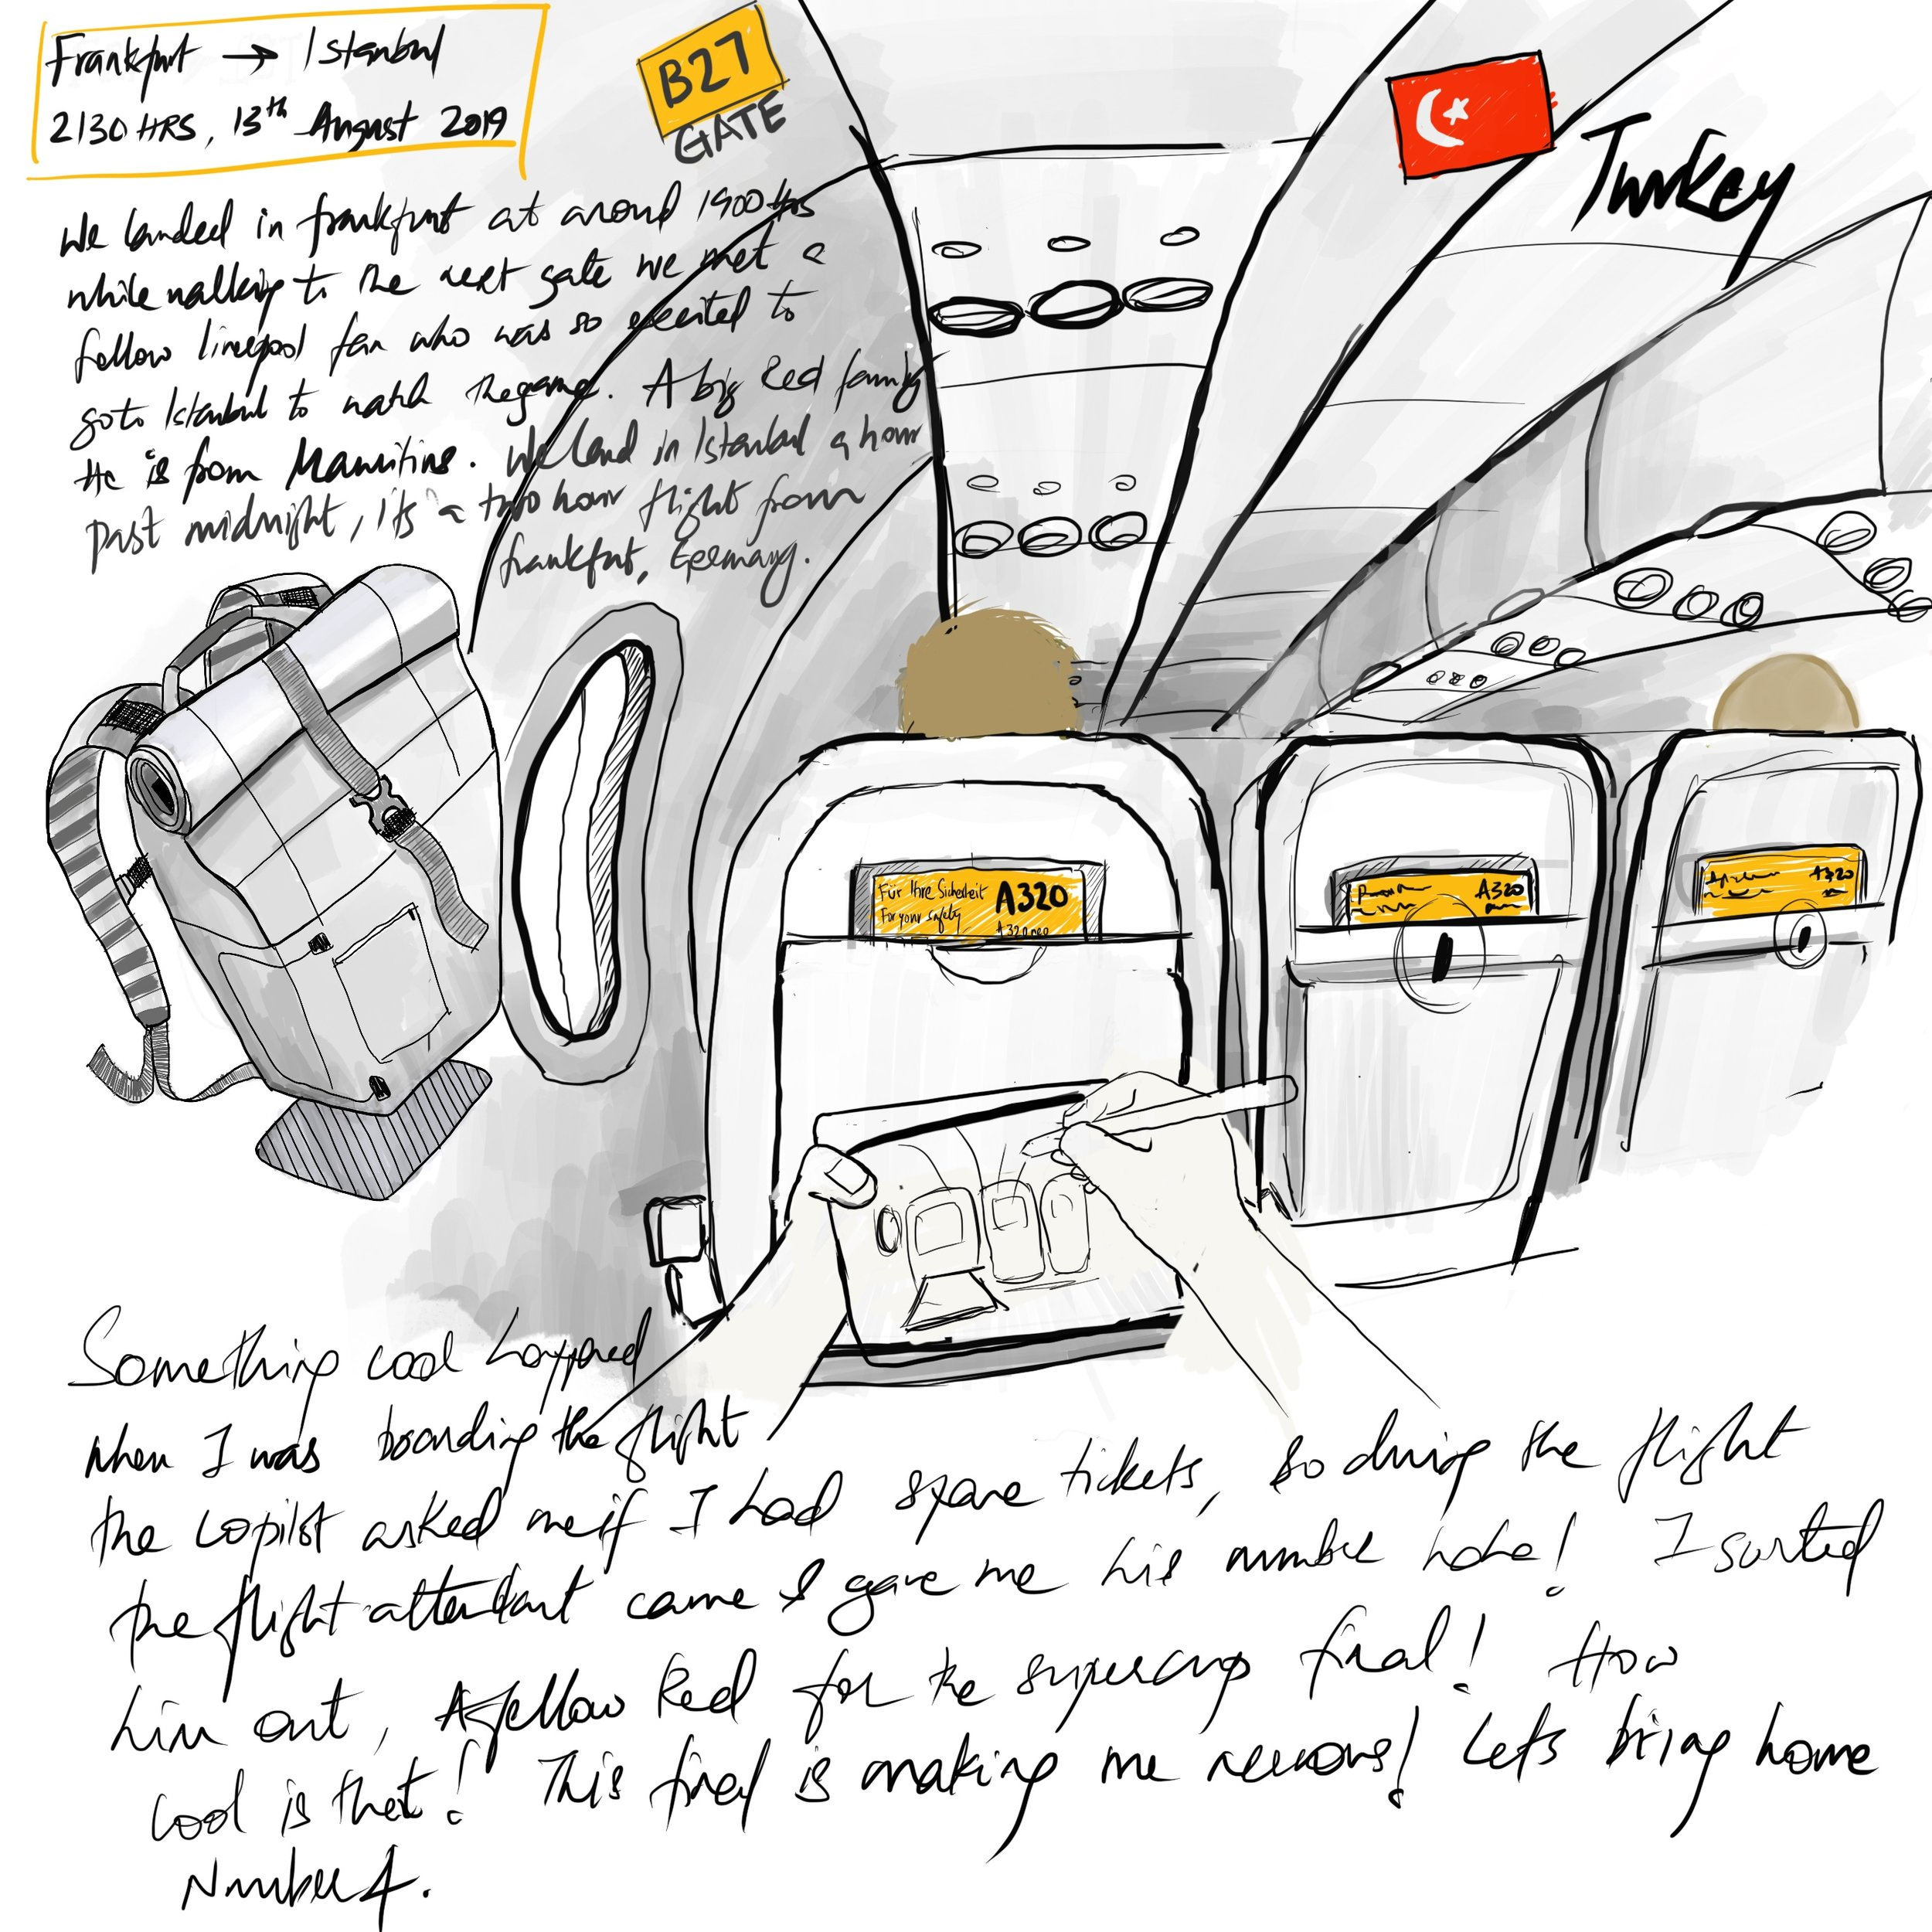 Turkey-travel-plane.jpg